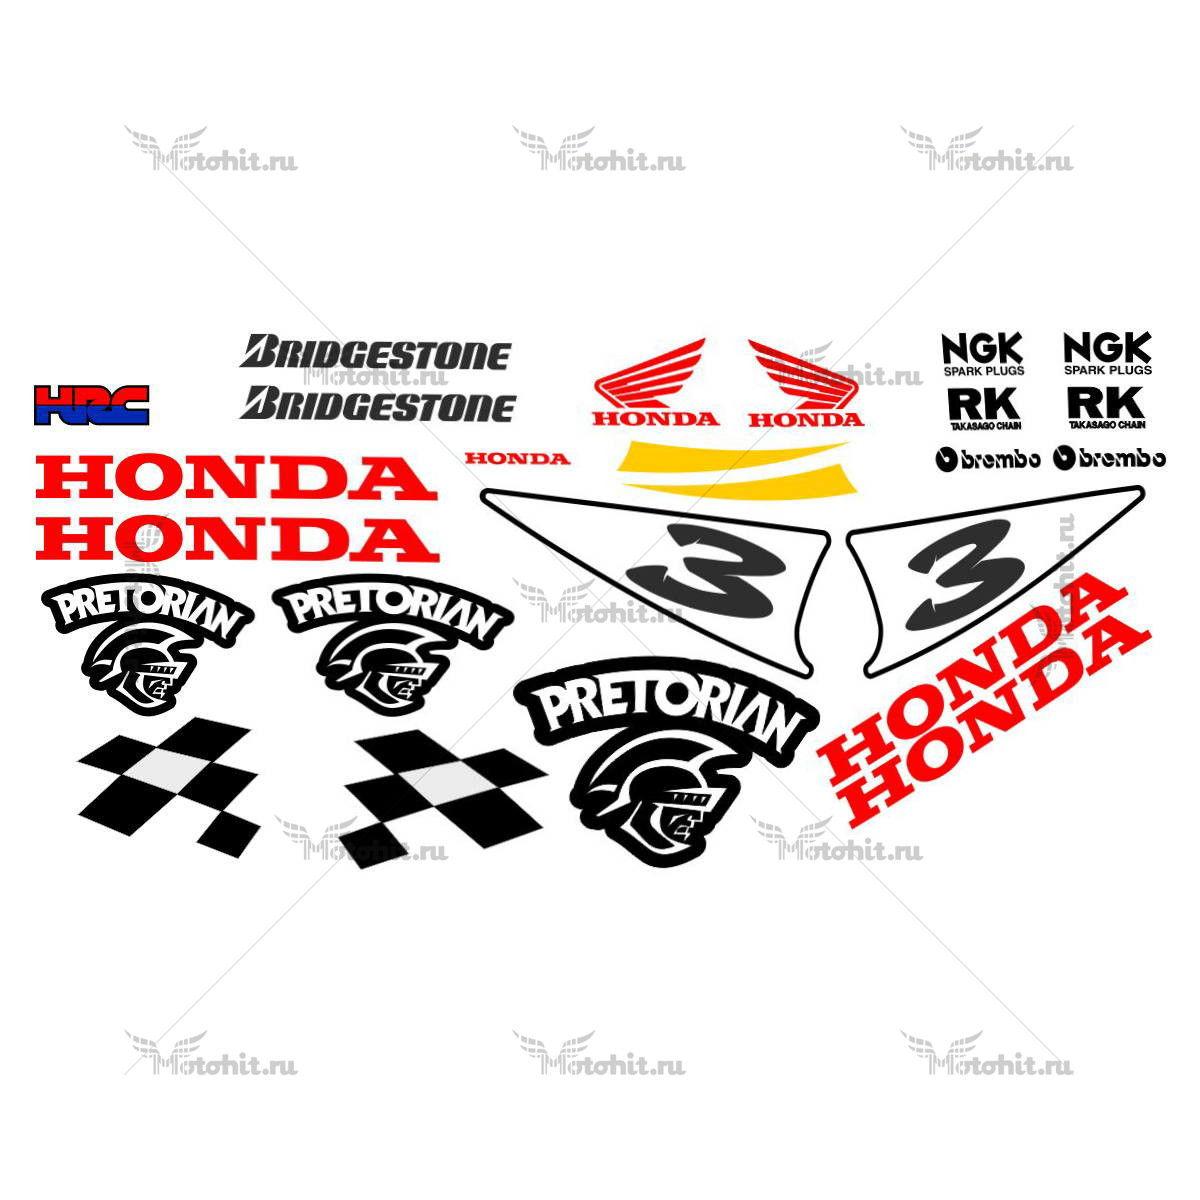 Комплект наклеек Honda CBR-600-RR PRETORIAN